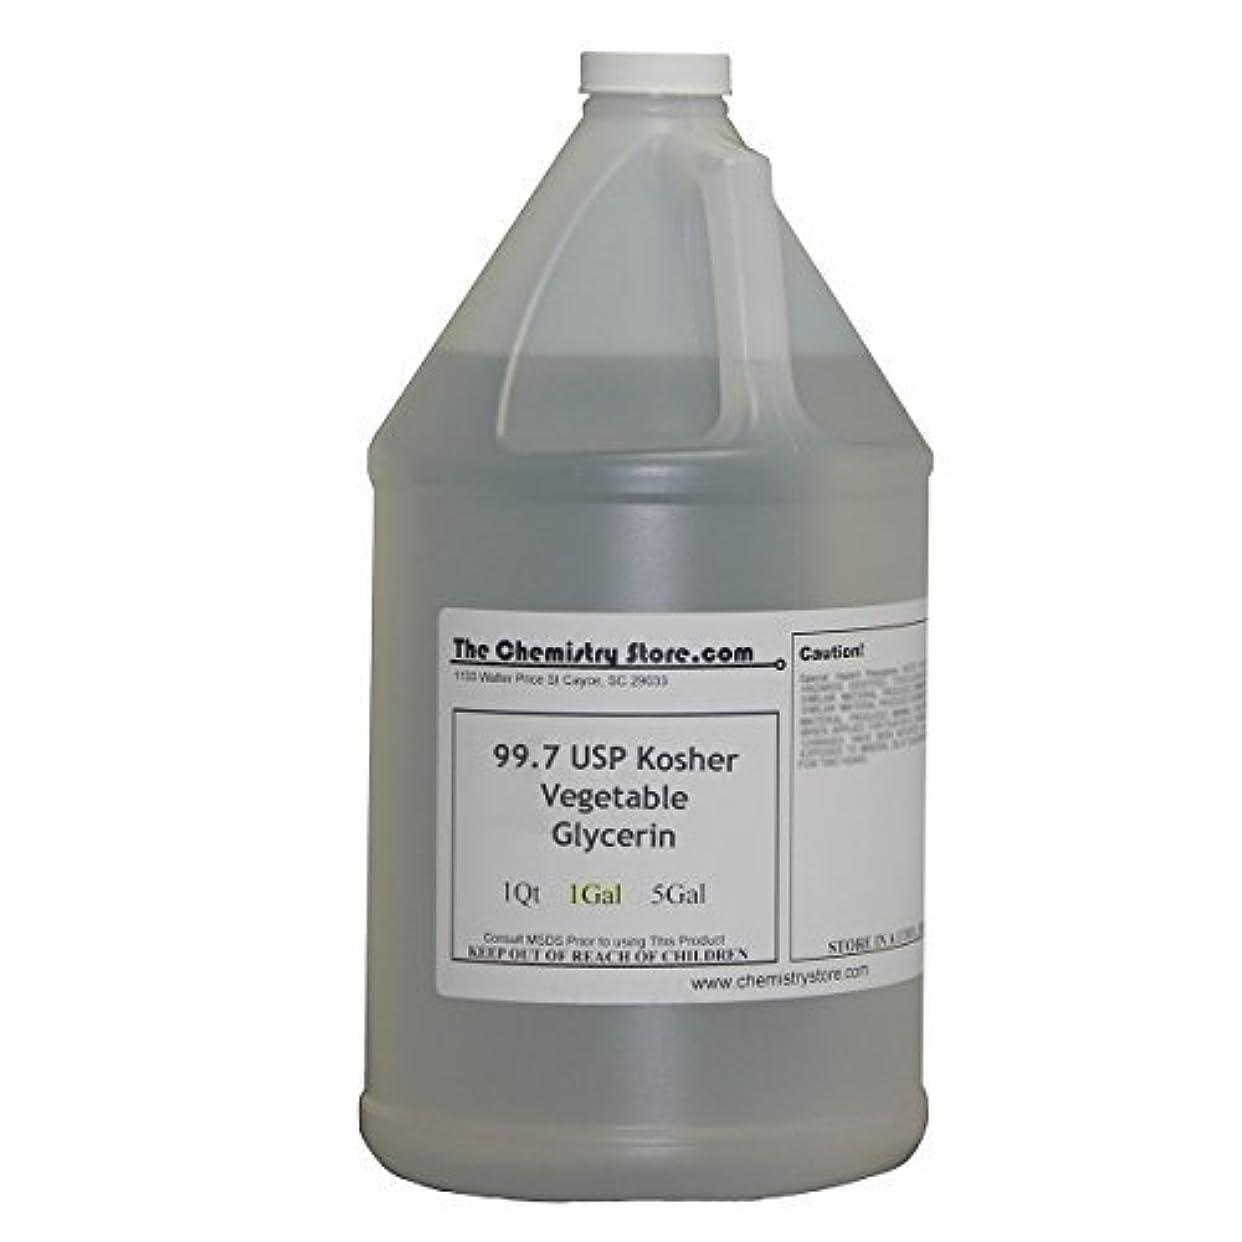 Kosher USP Food Grade 1 Gallon Vegetable Glycerin (99.7% USP) by The Chemistry Store